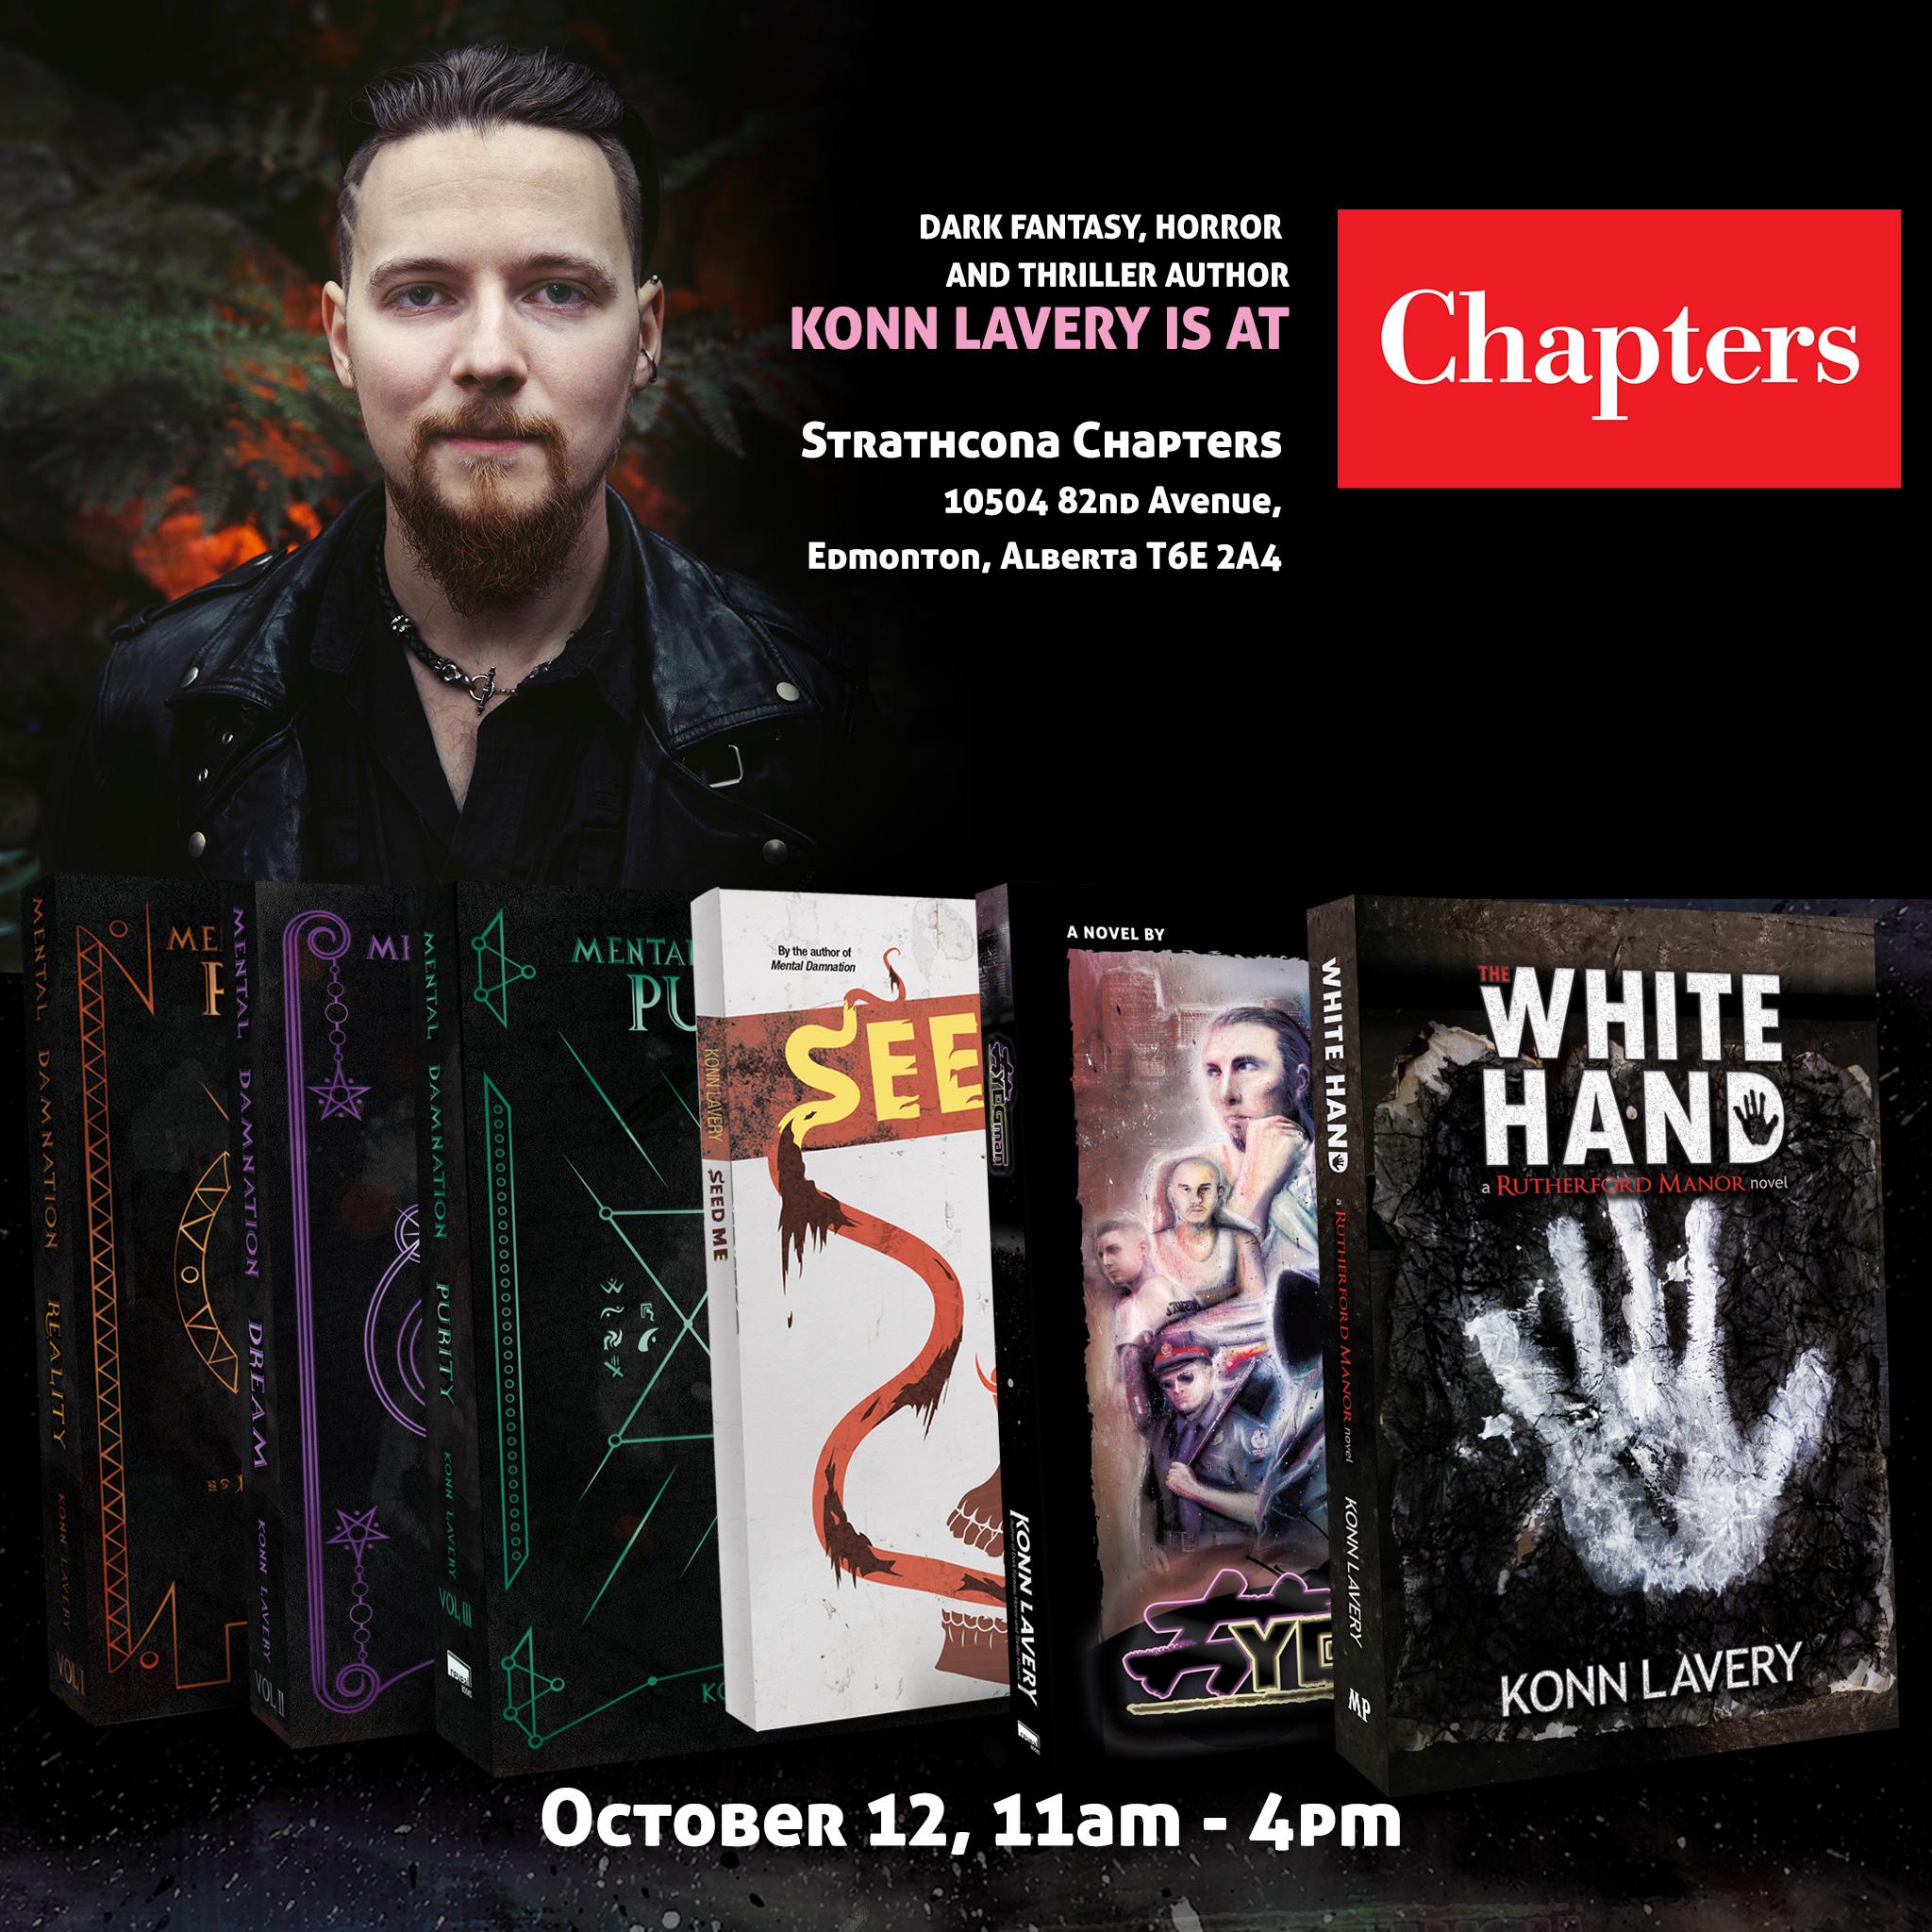 Halloween Book Signing